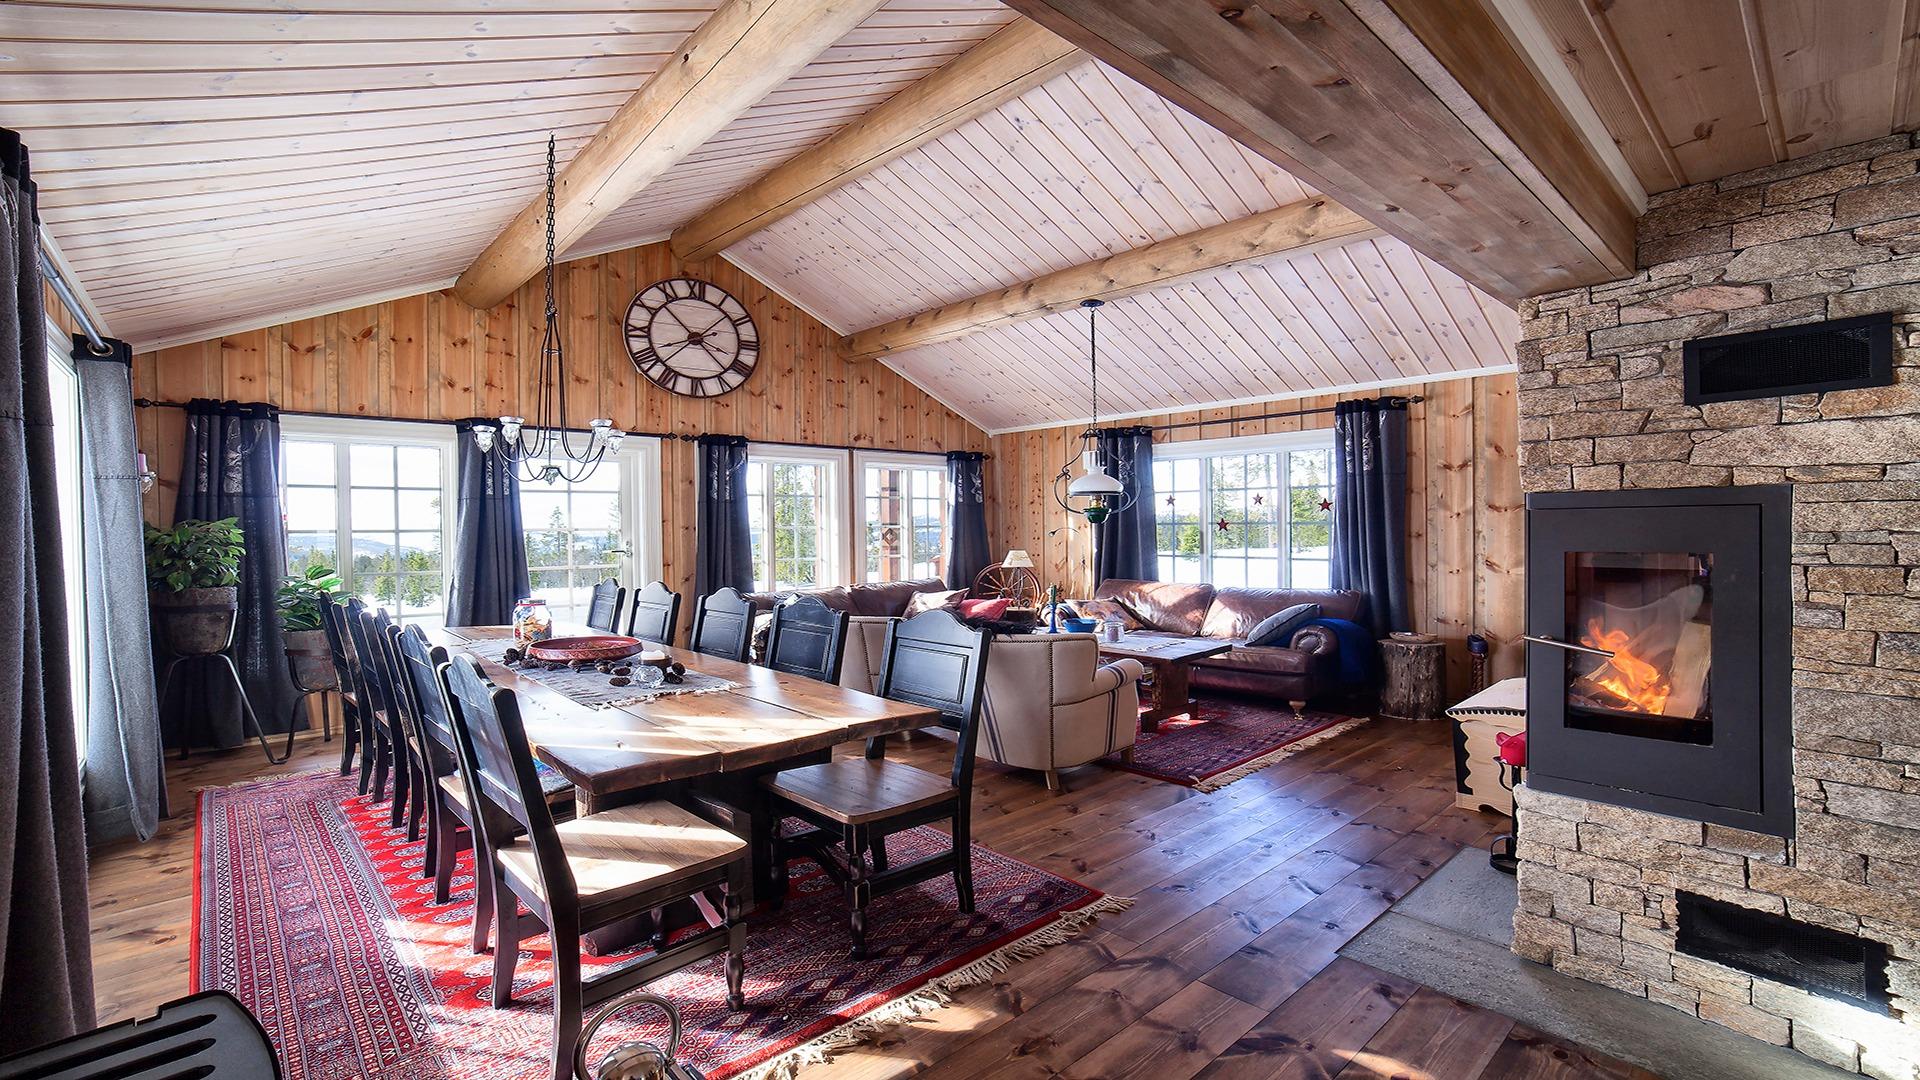 Ei stor og prangende stue med synlige stokker i taket.